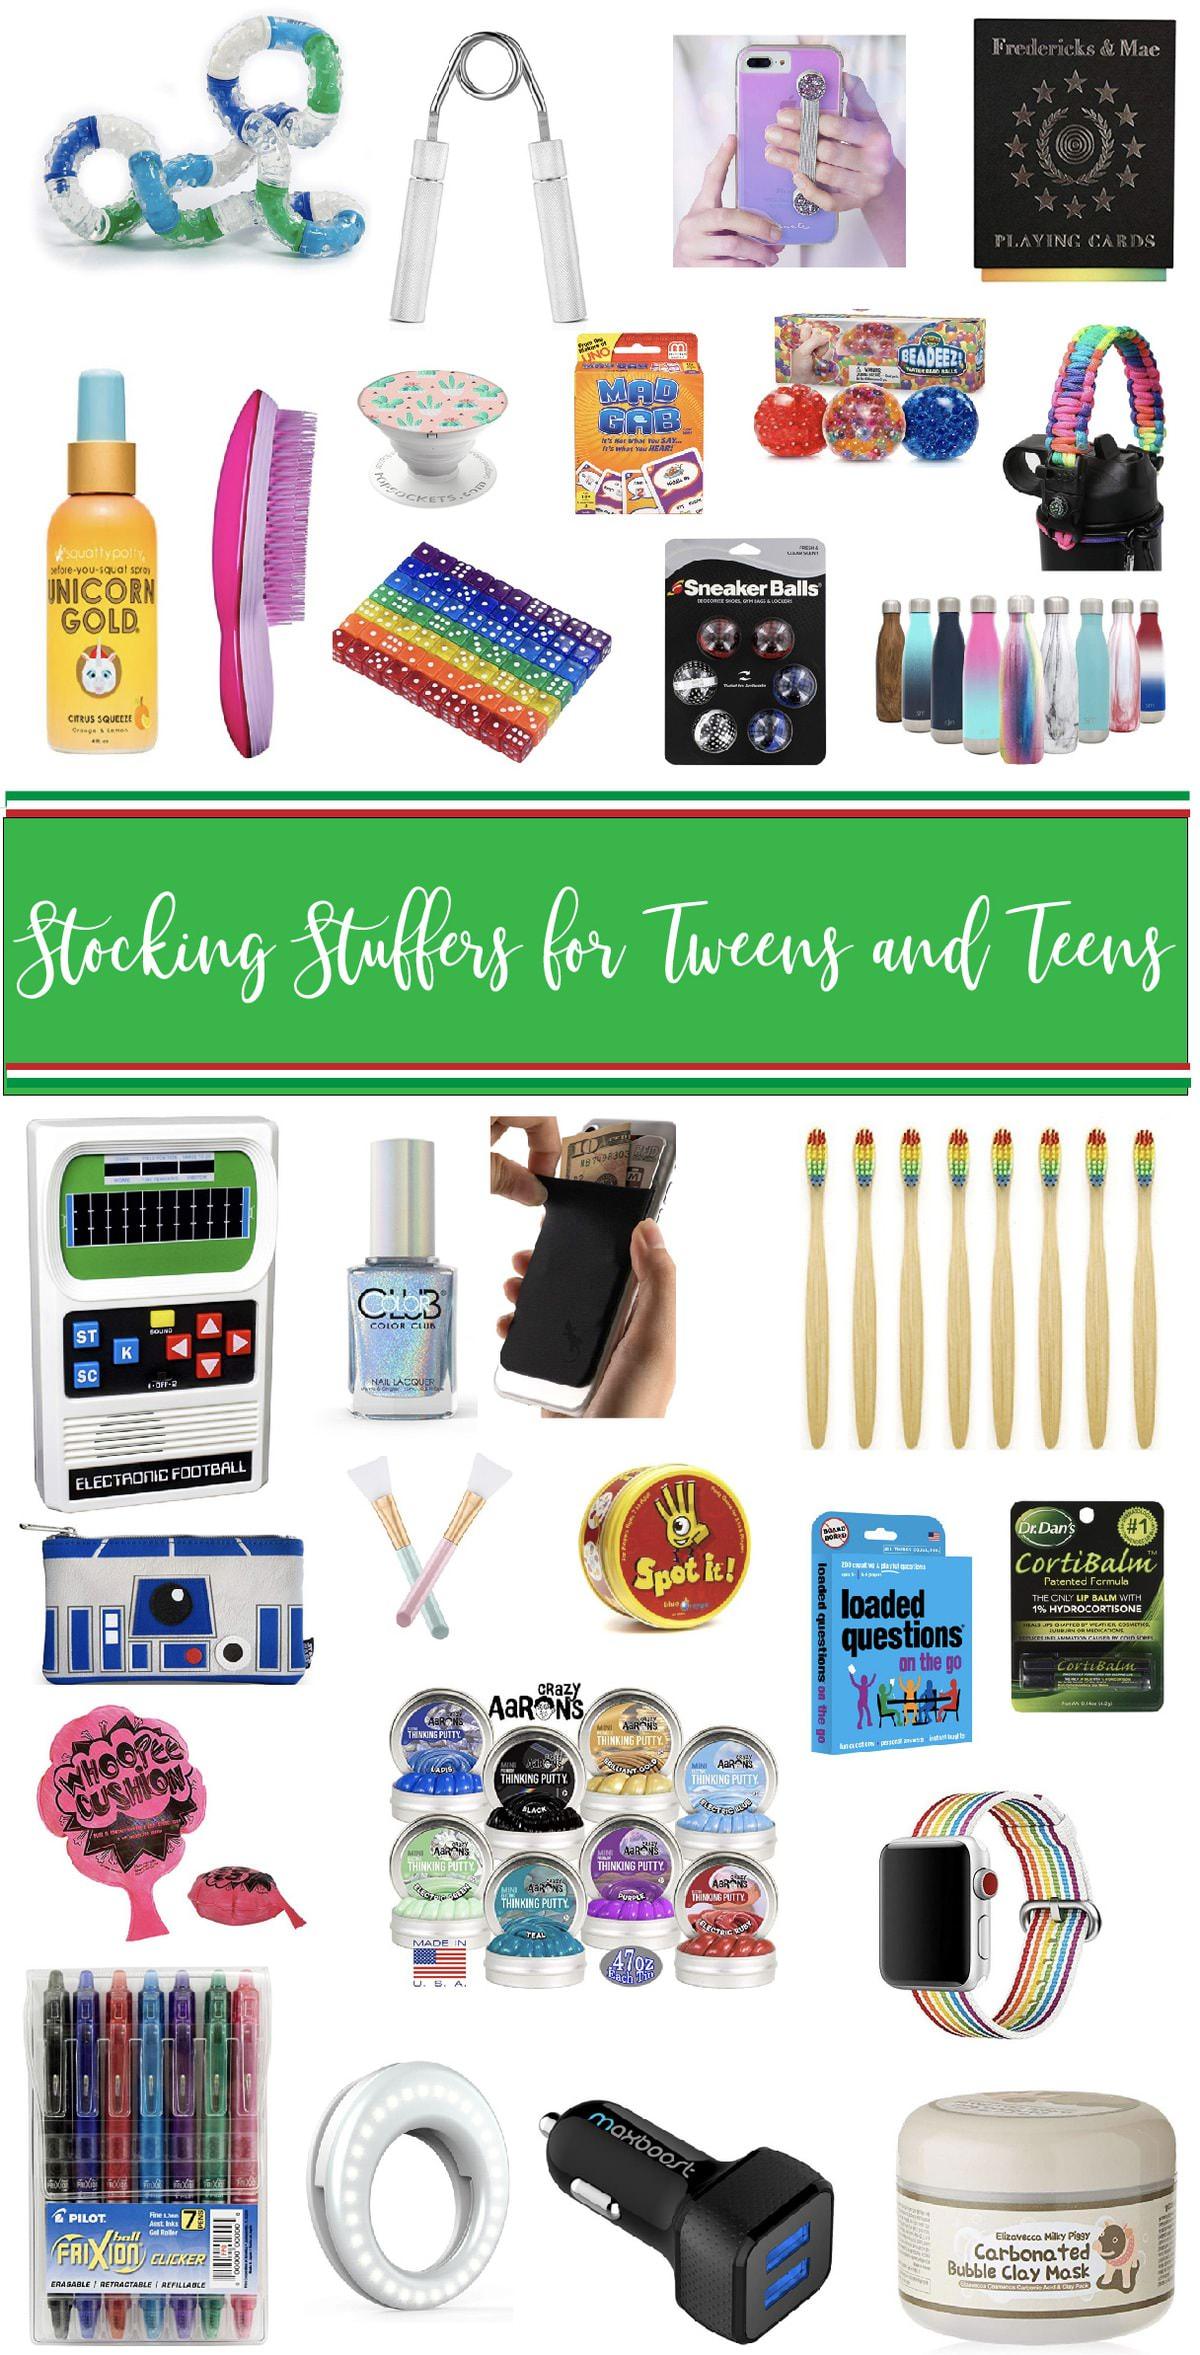 Best Stocking Stuffers for Tweens and Teens